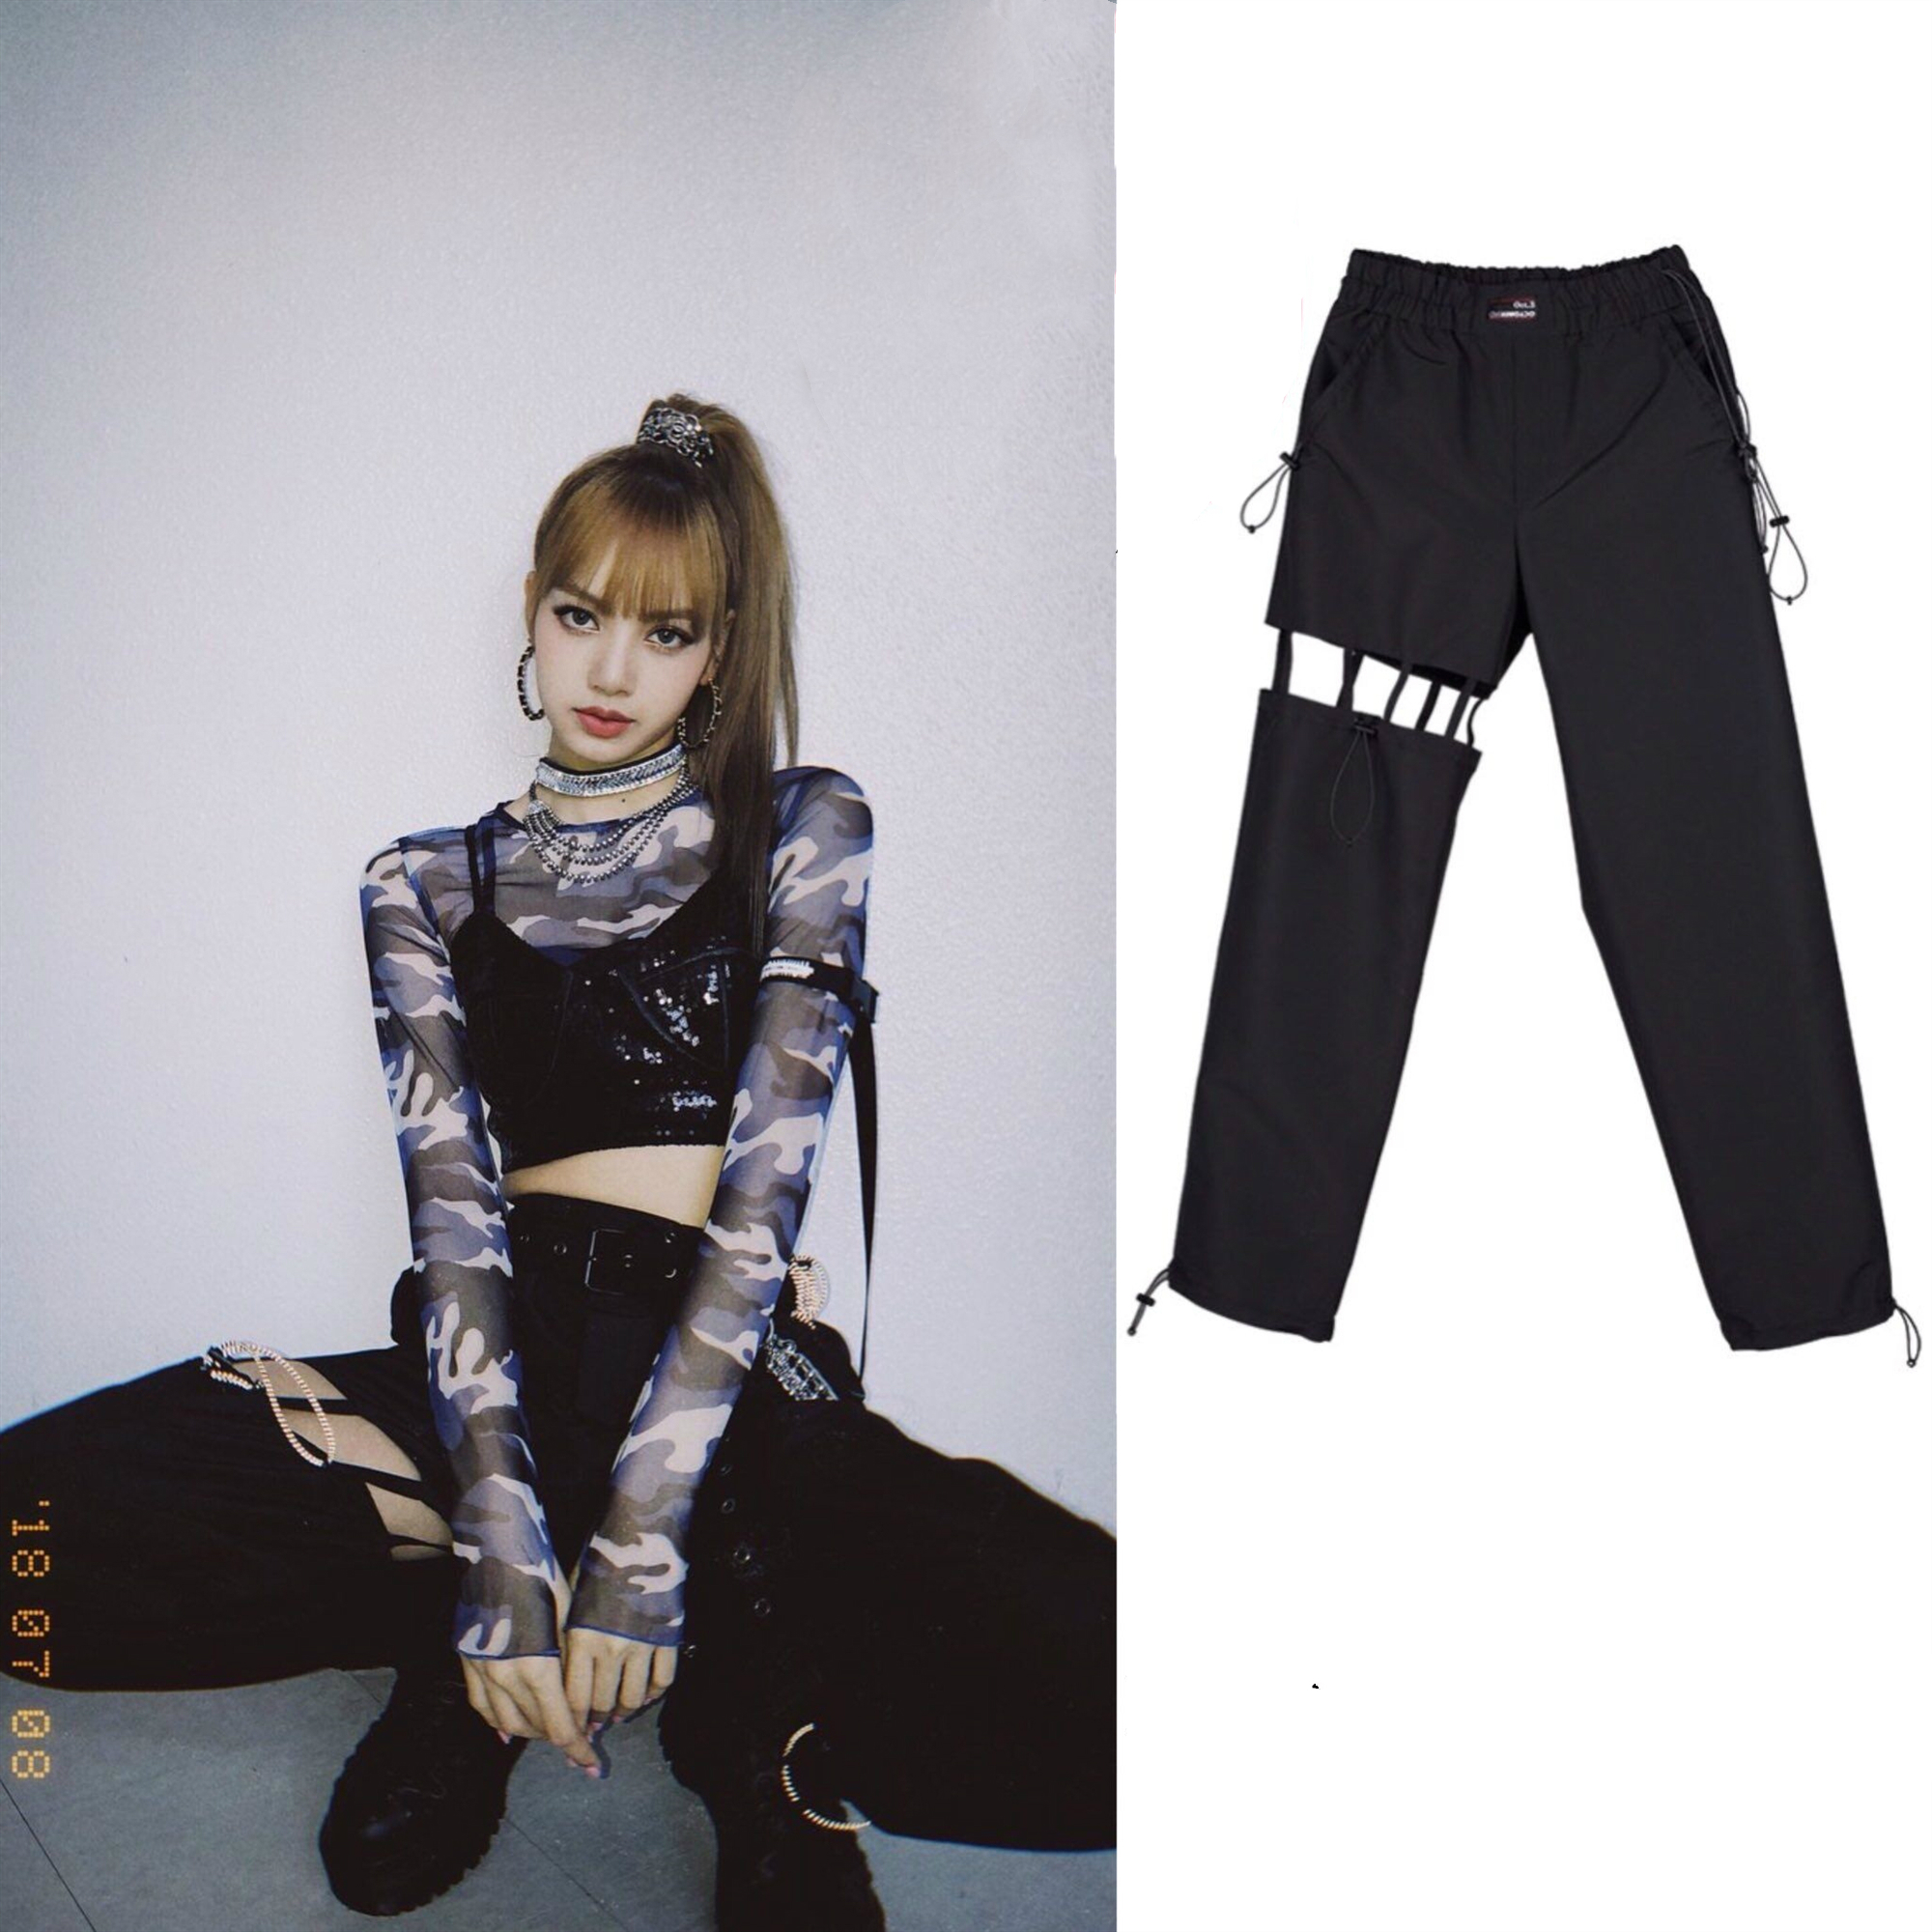 Harajuku New BLACKPINK LISA The Same High Waist Pants Women Casual Streetwear Summer Korean Trousers Female Fans Sexy Sweatpants